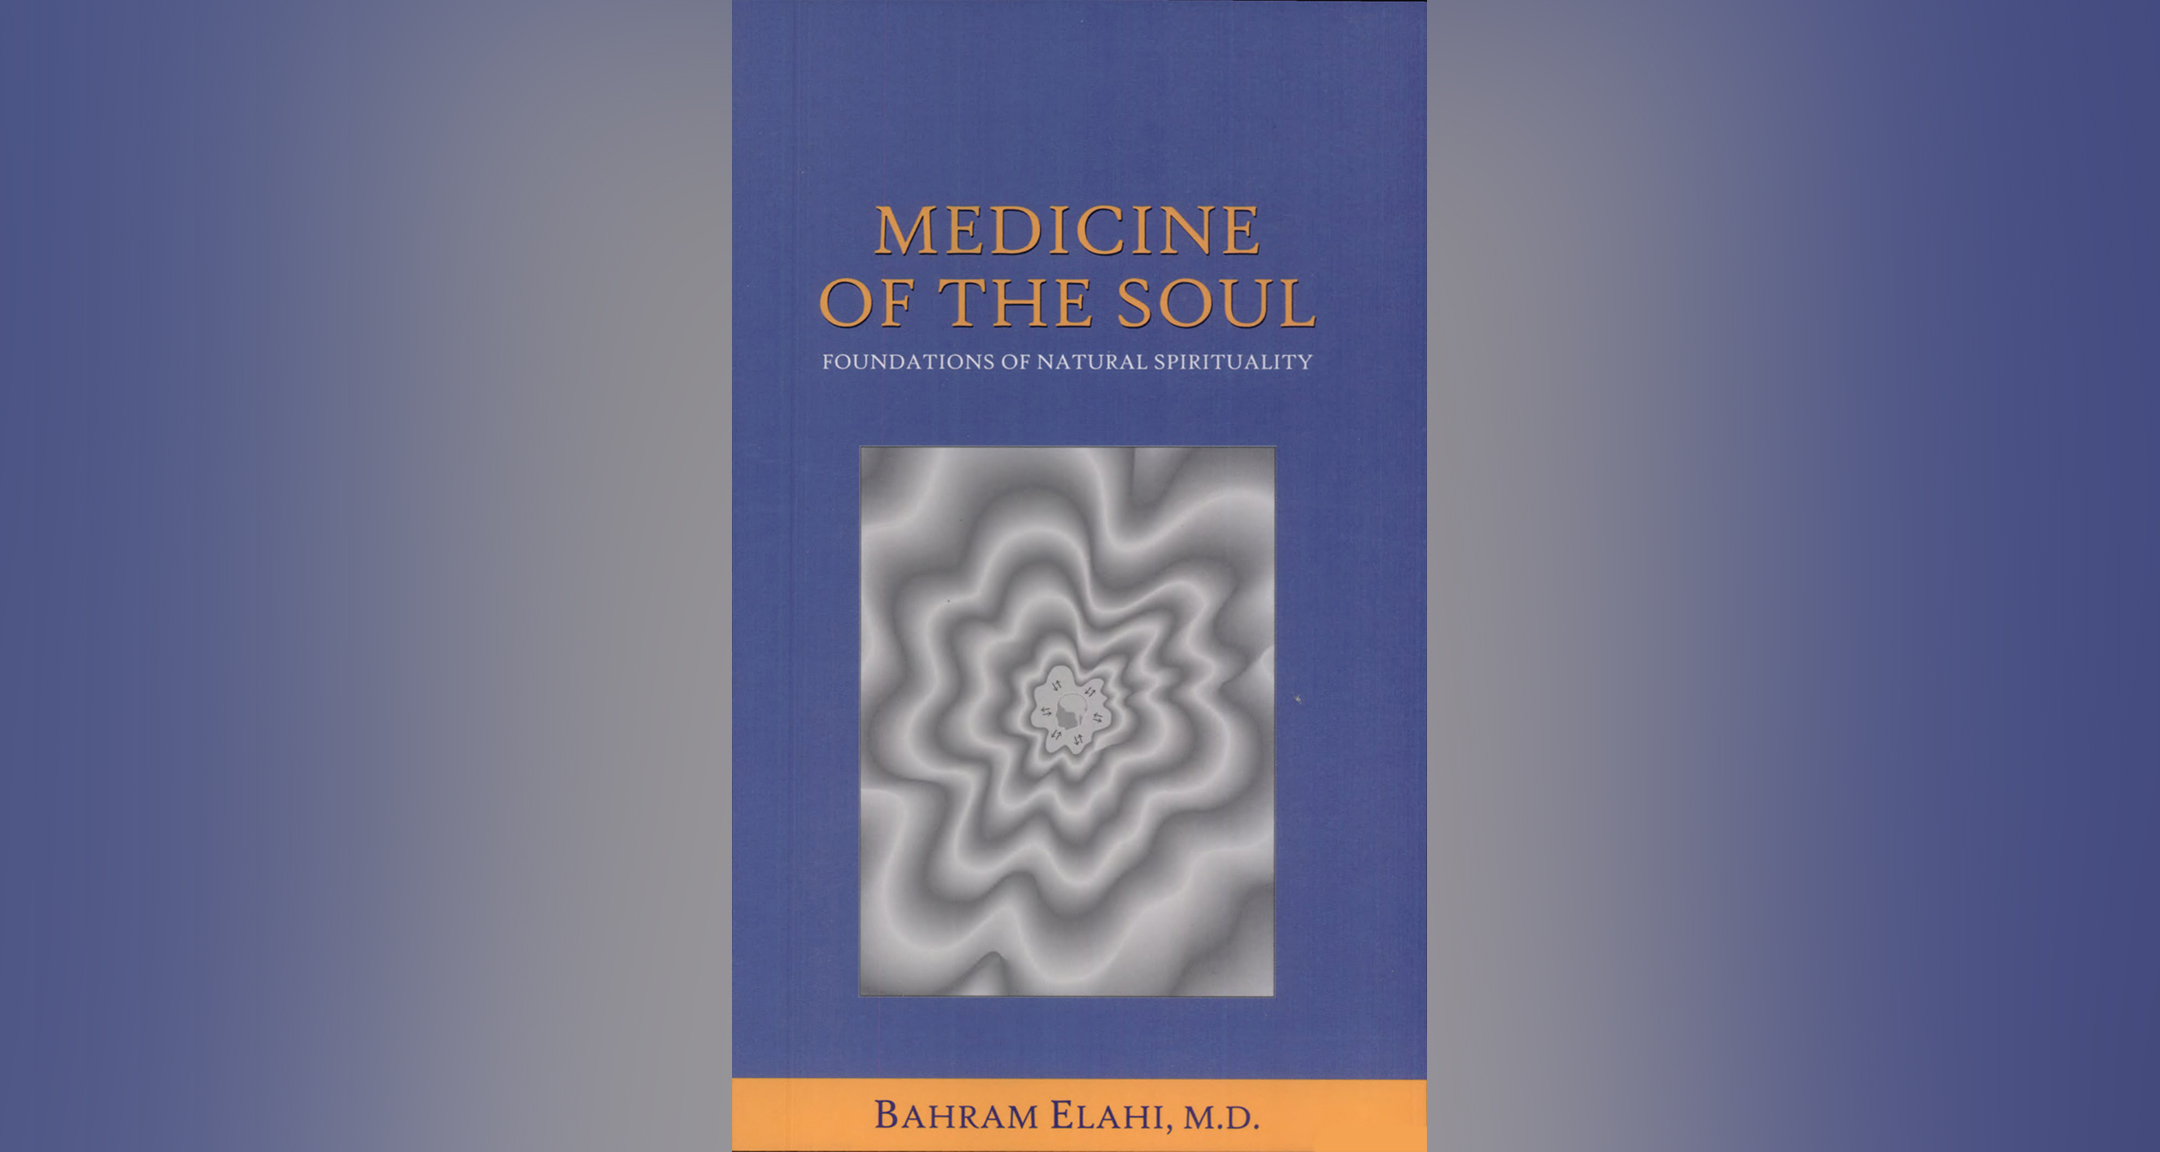 Medicine of the soul